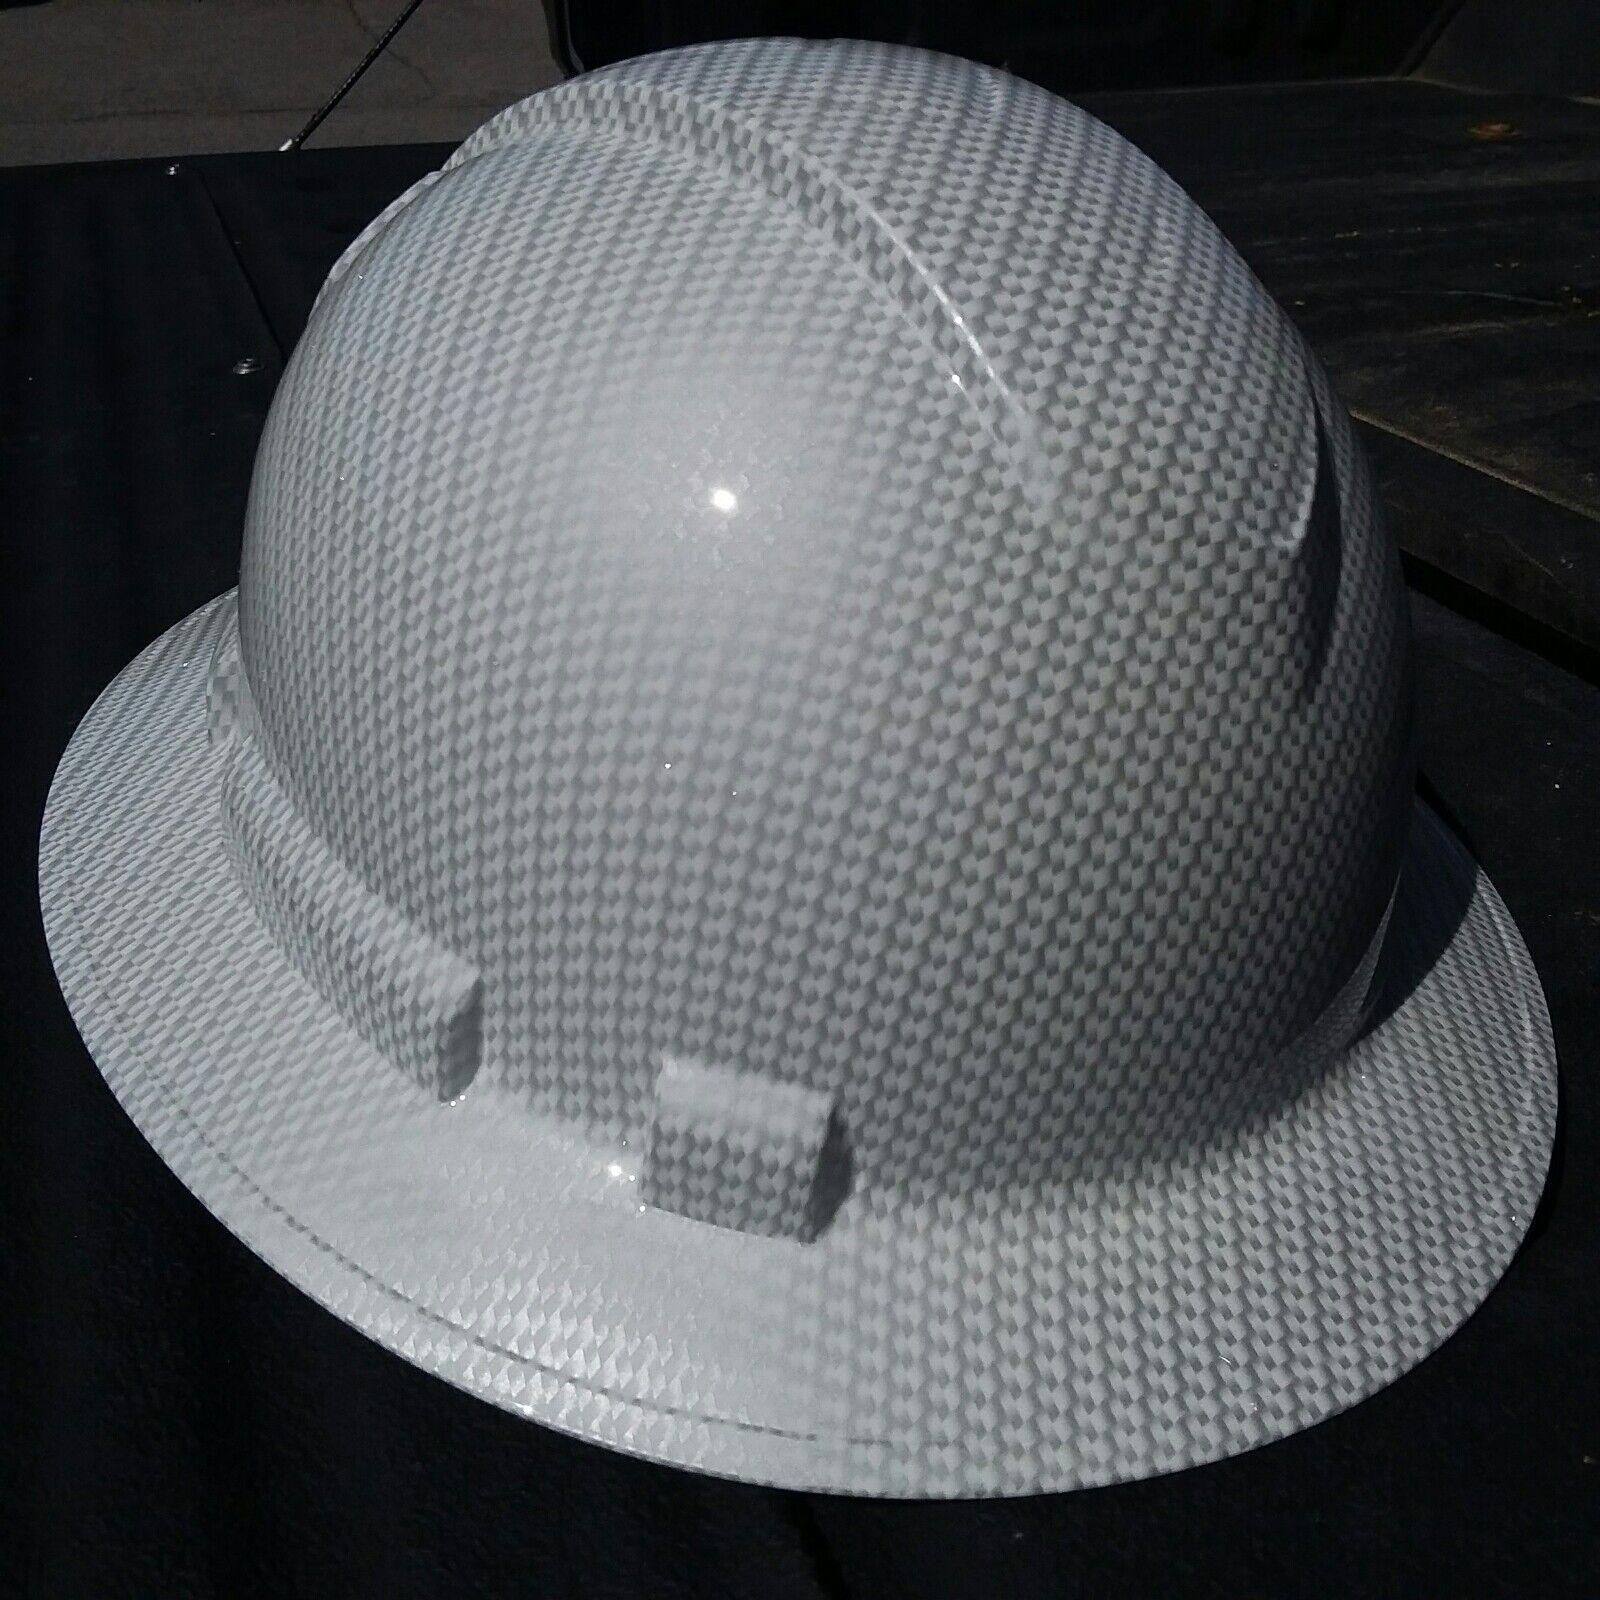 FULL BRIM Hard Hat custom hydro dipped , NEW WHITE CARBON FIBER HOT NEW HYDRO 1